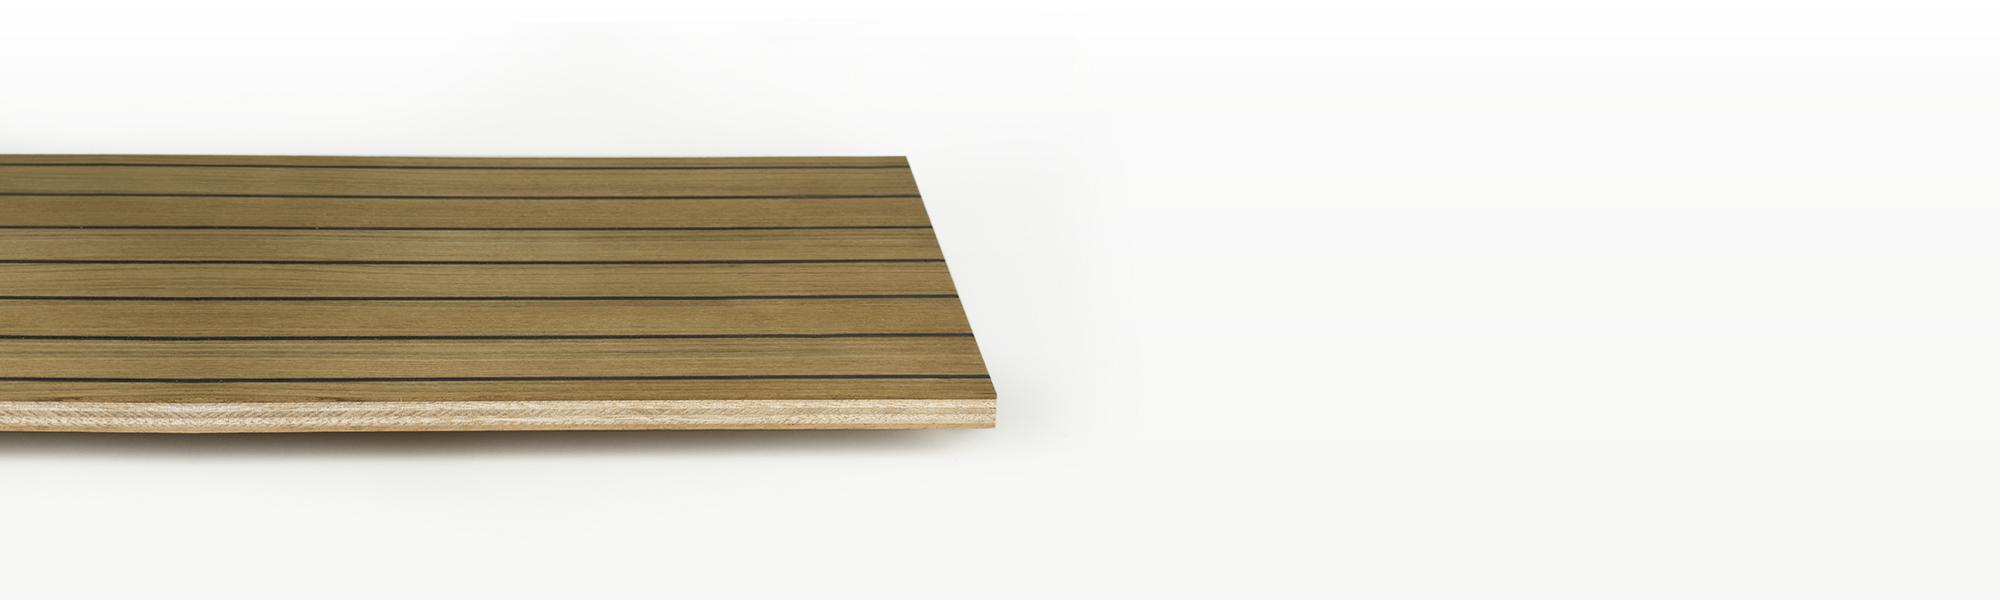 Pannelli Decking Teak Nord Compensati Spa